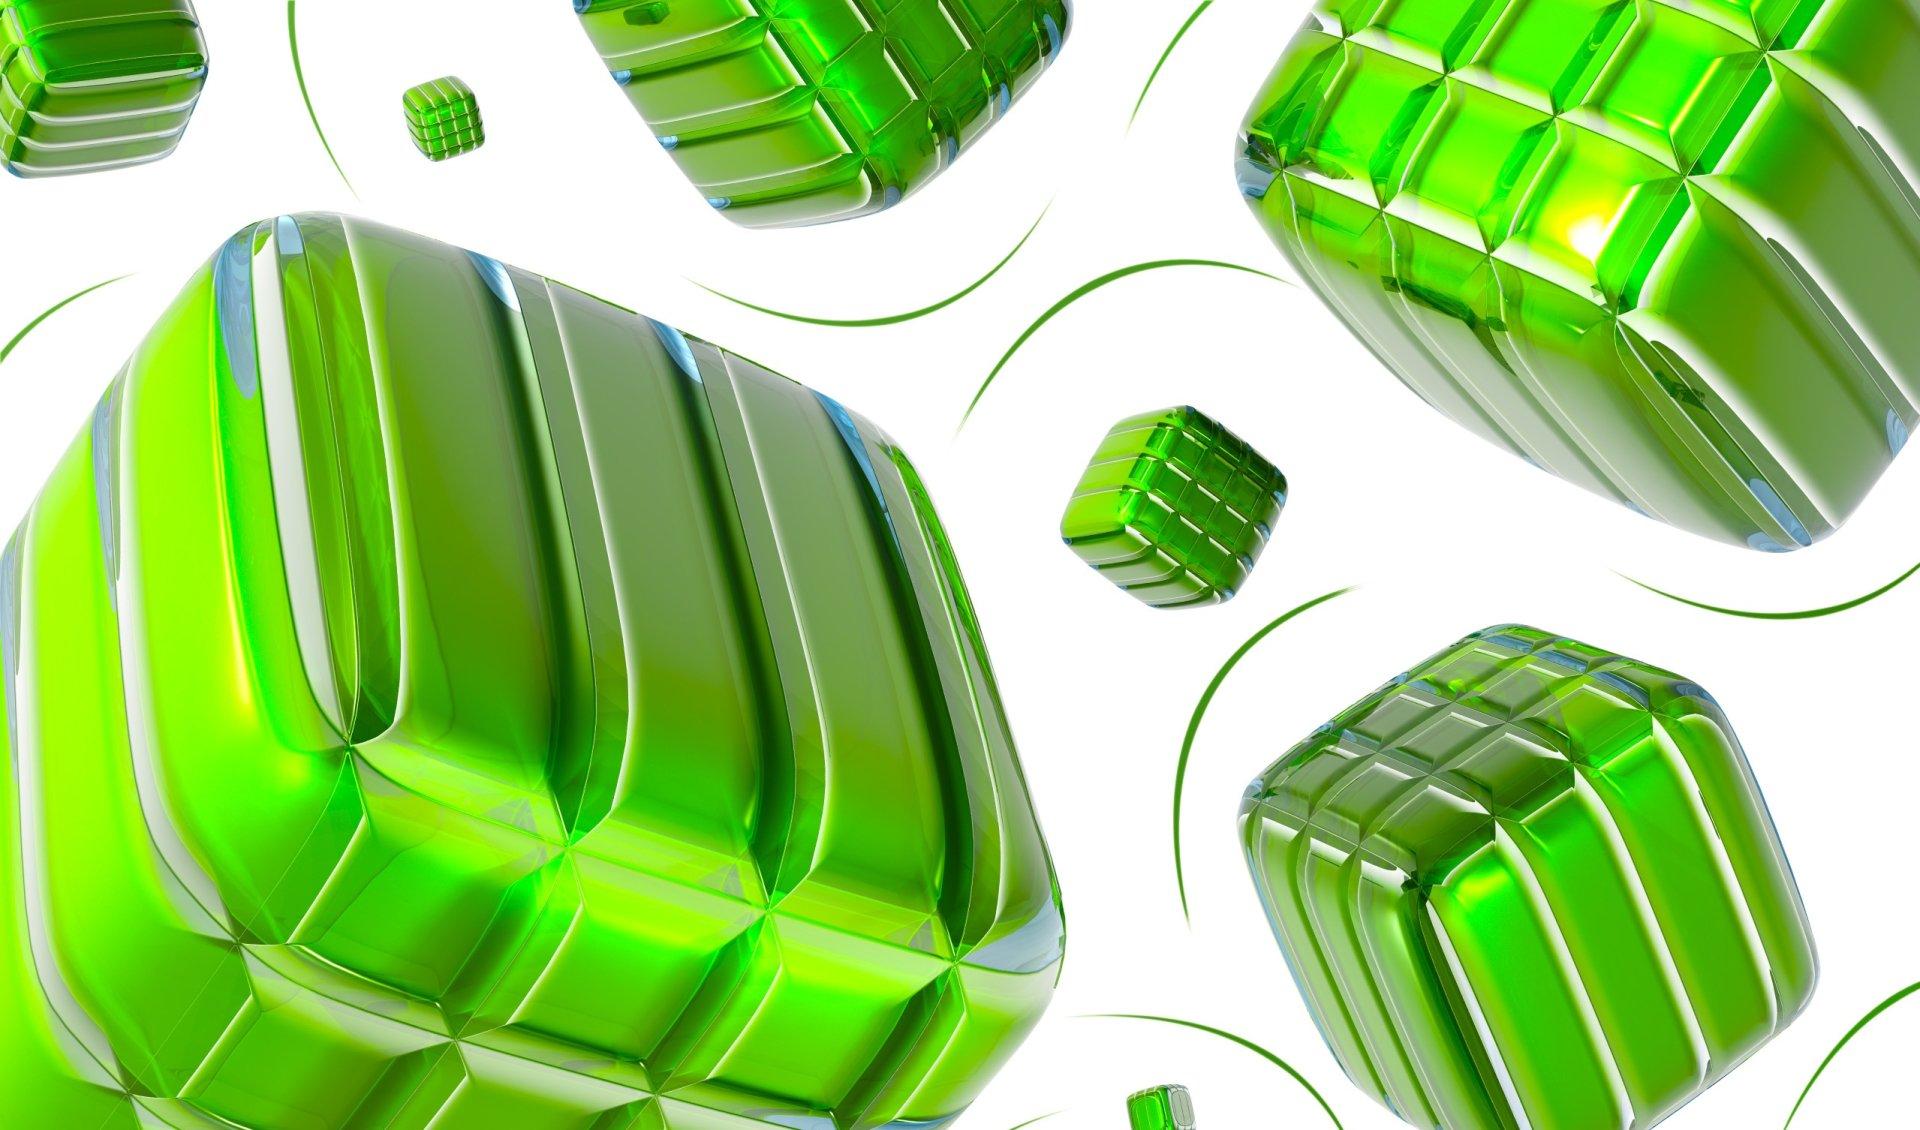 Abstract - Digital Art  Digital Abstract Artistic Green 3D Wallpaper